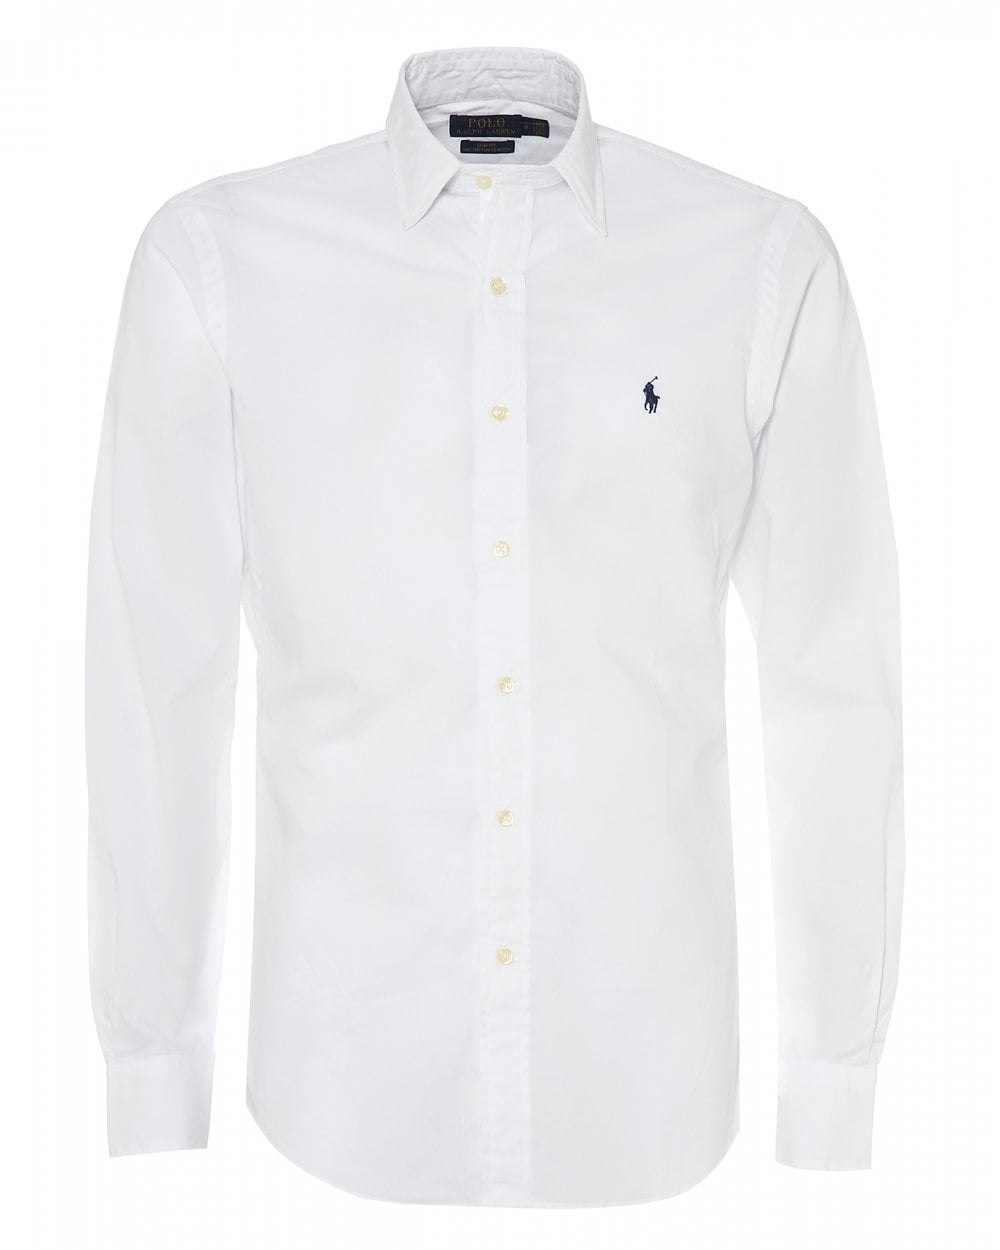 Ralph Lauren Mens Luxury Oxford Shirt White Slim Fit Shirt